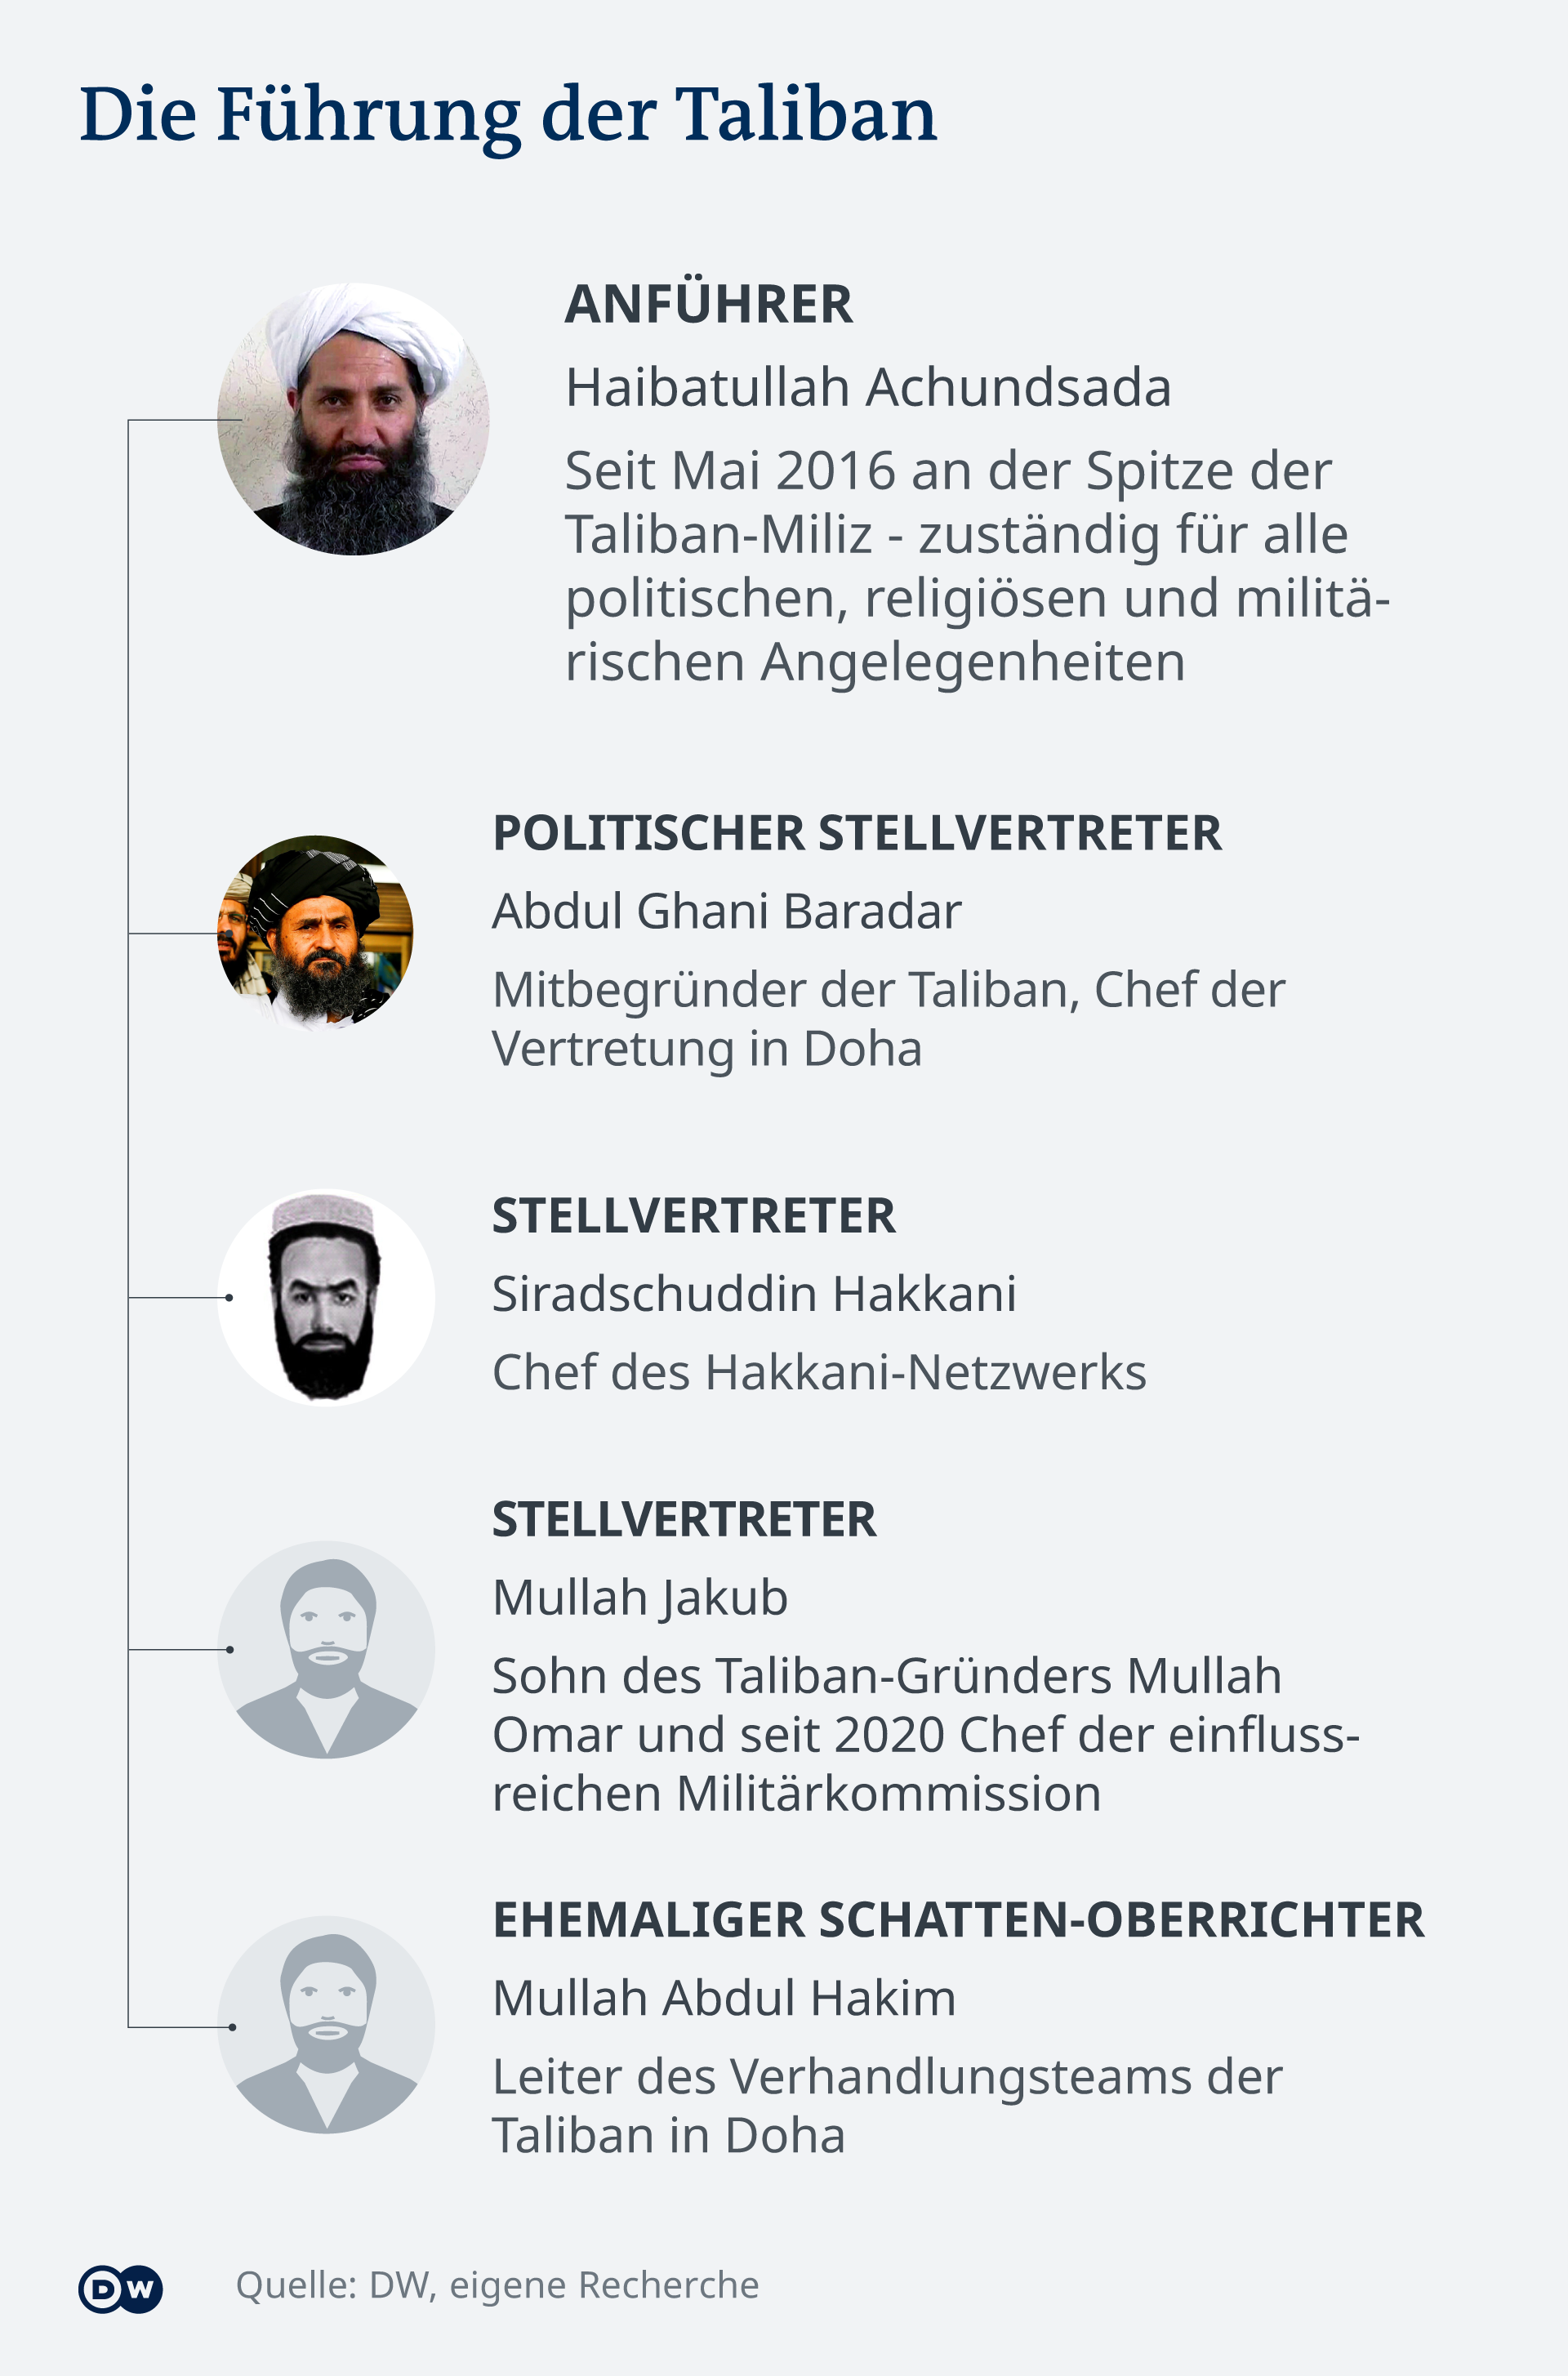 Infografik Die Führung der Taliban DE